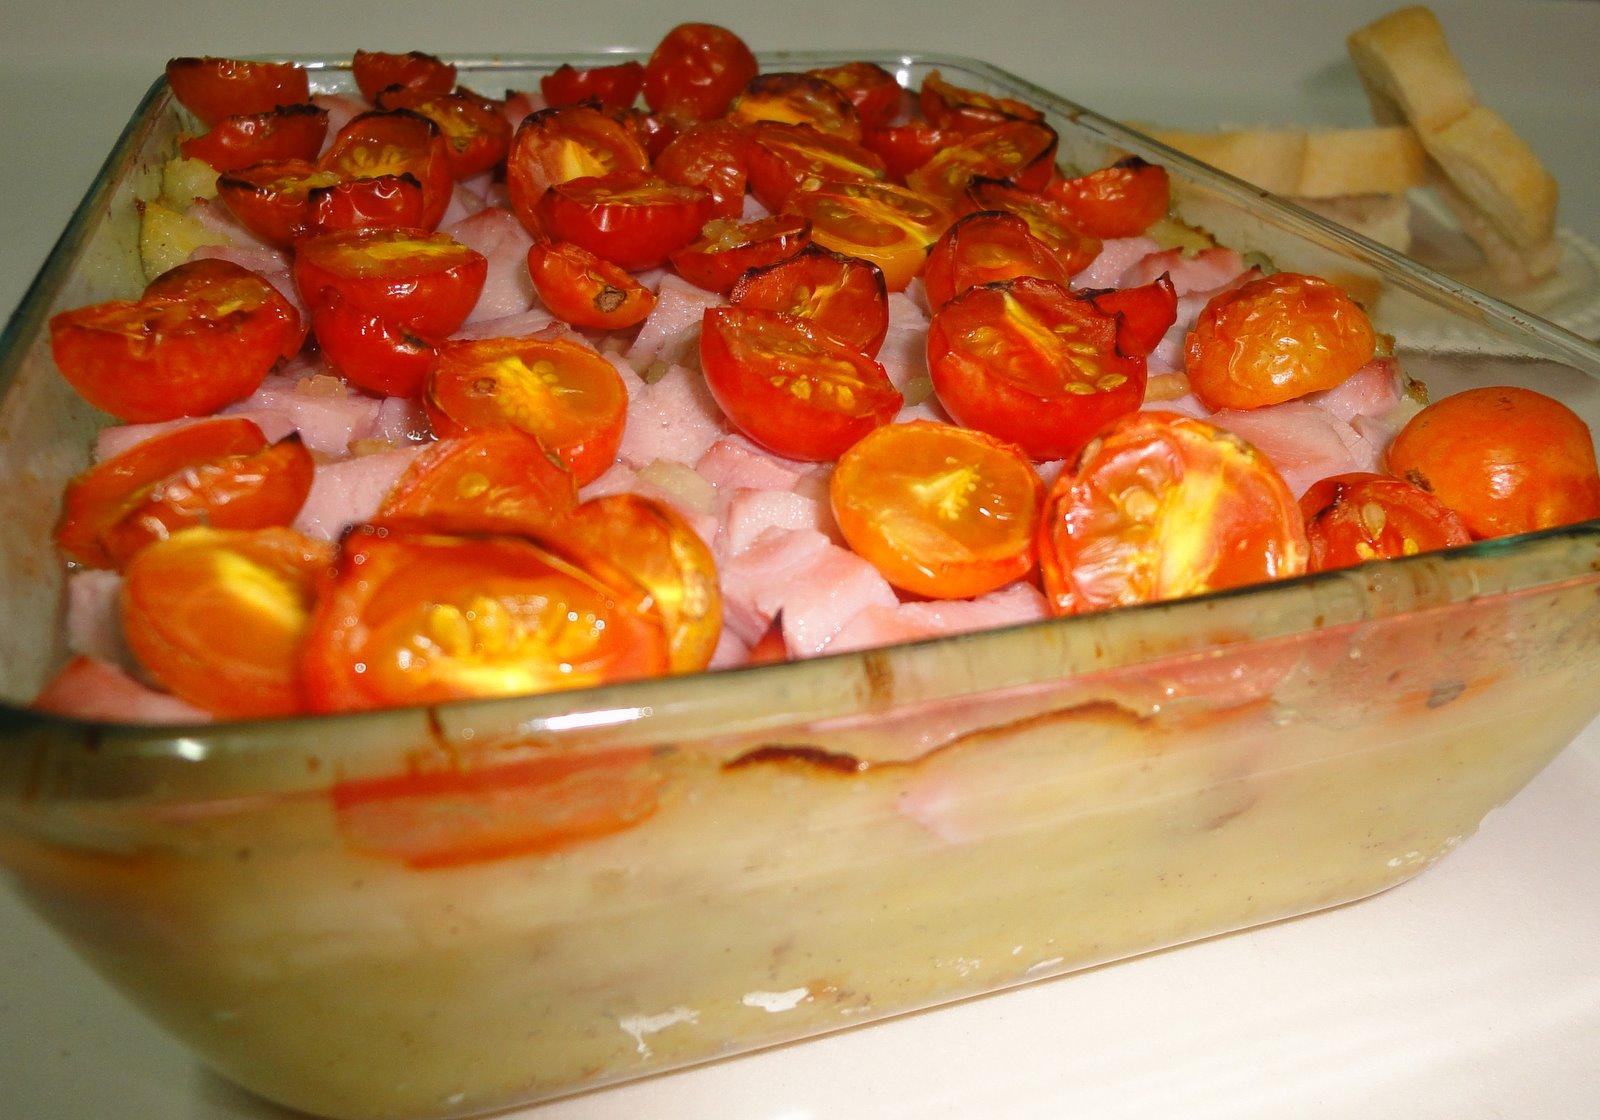 minick menus: potatoes, ham and tomato casserole